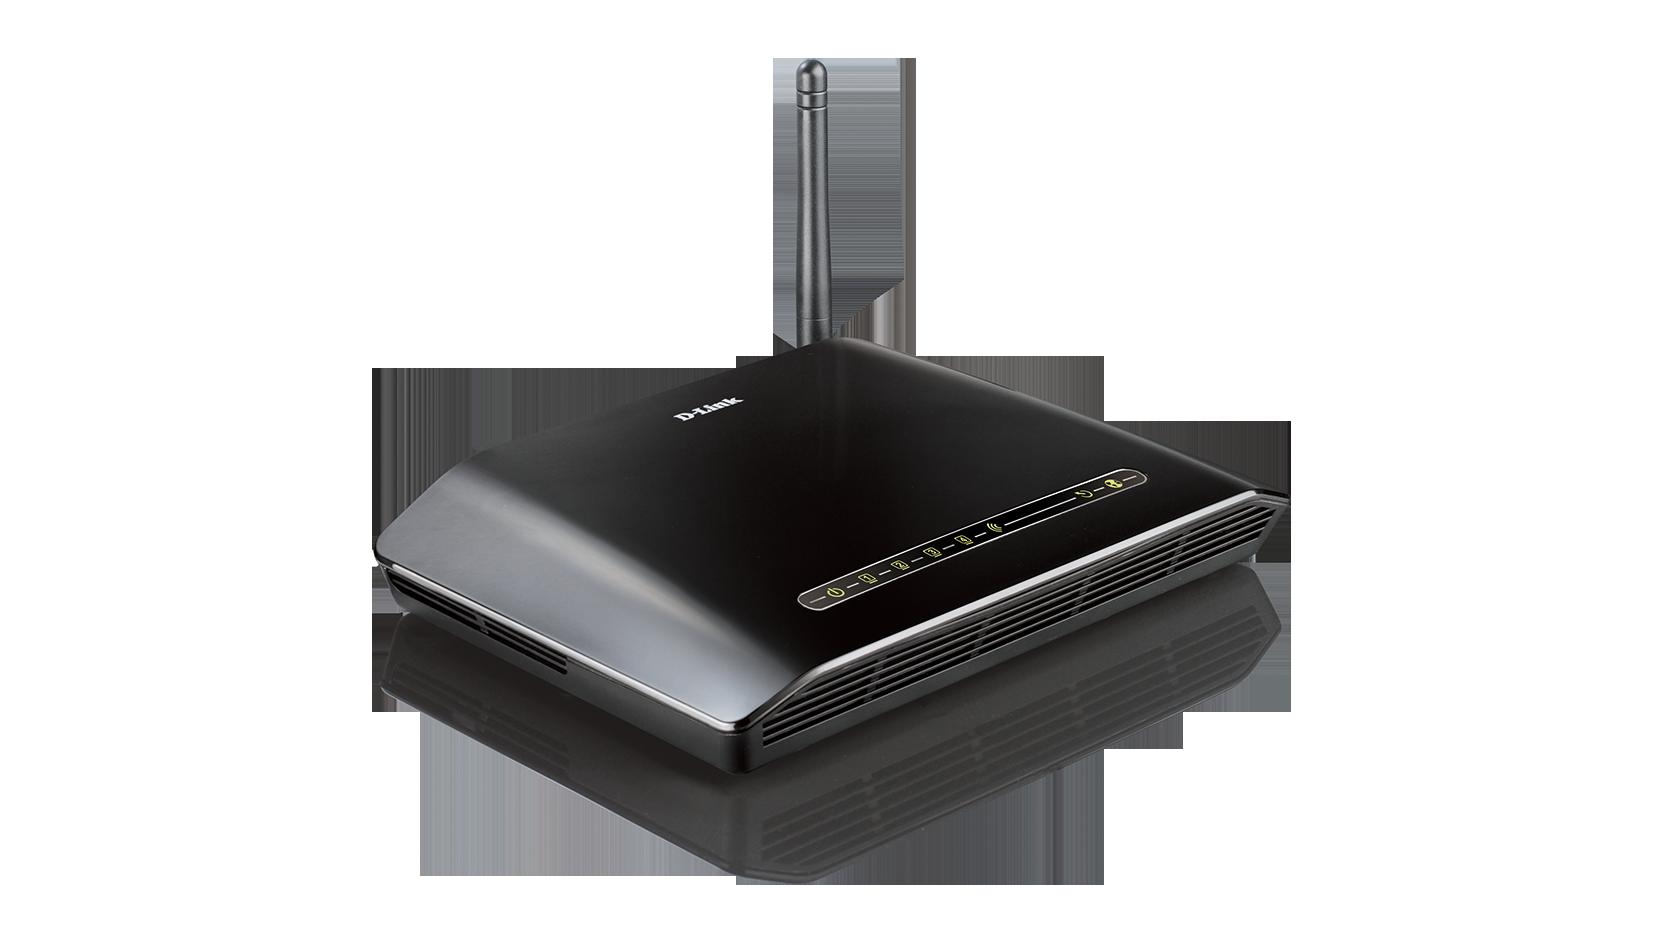 D-Link DSL-2641B Rev B3 Modem X64 Driver Download